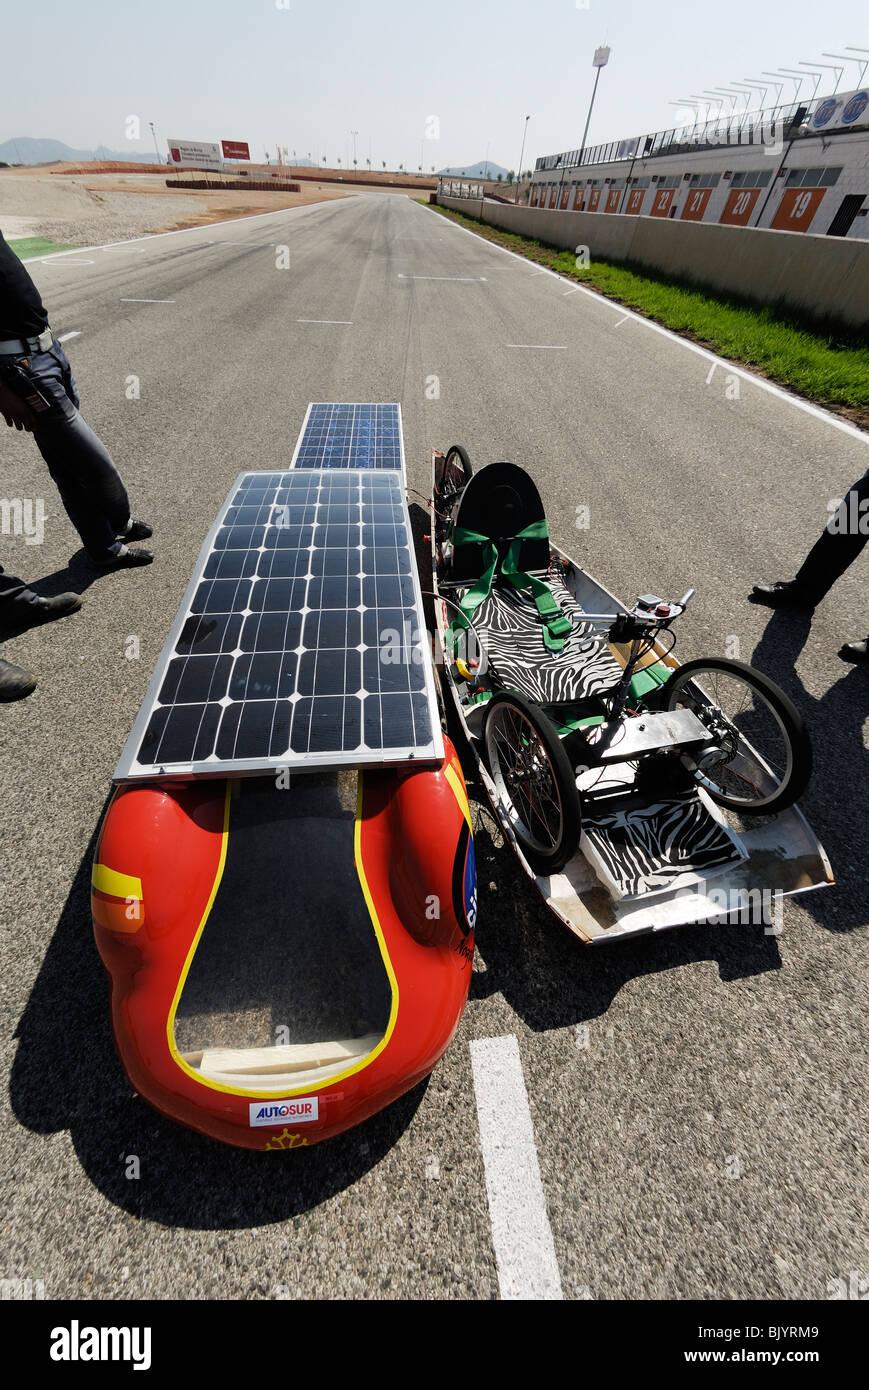 Solar betriebene Fahrzeug Stockbild